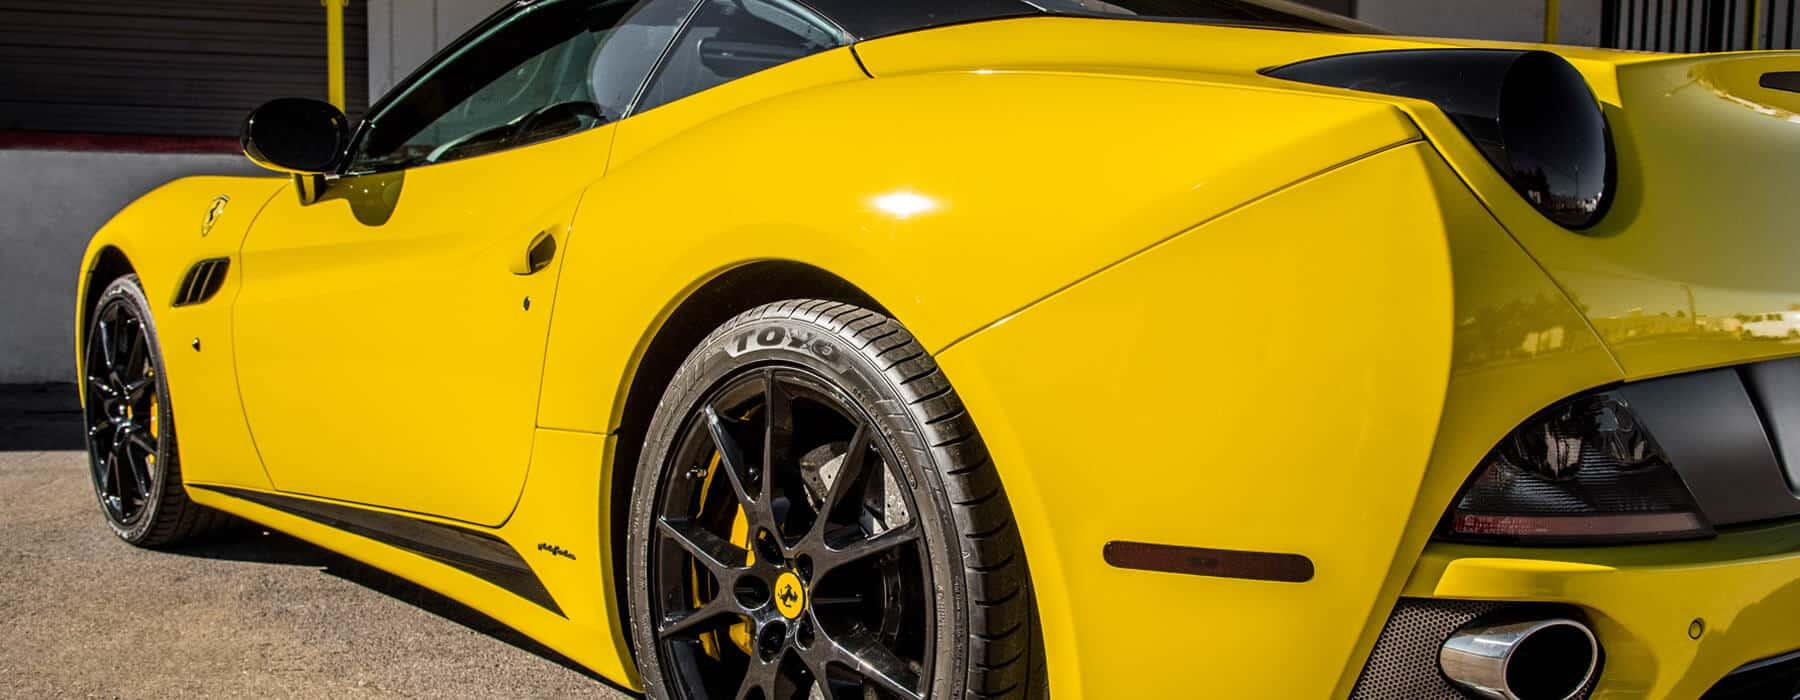 Government Car Rental Programs  Dollar Rent A Car